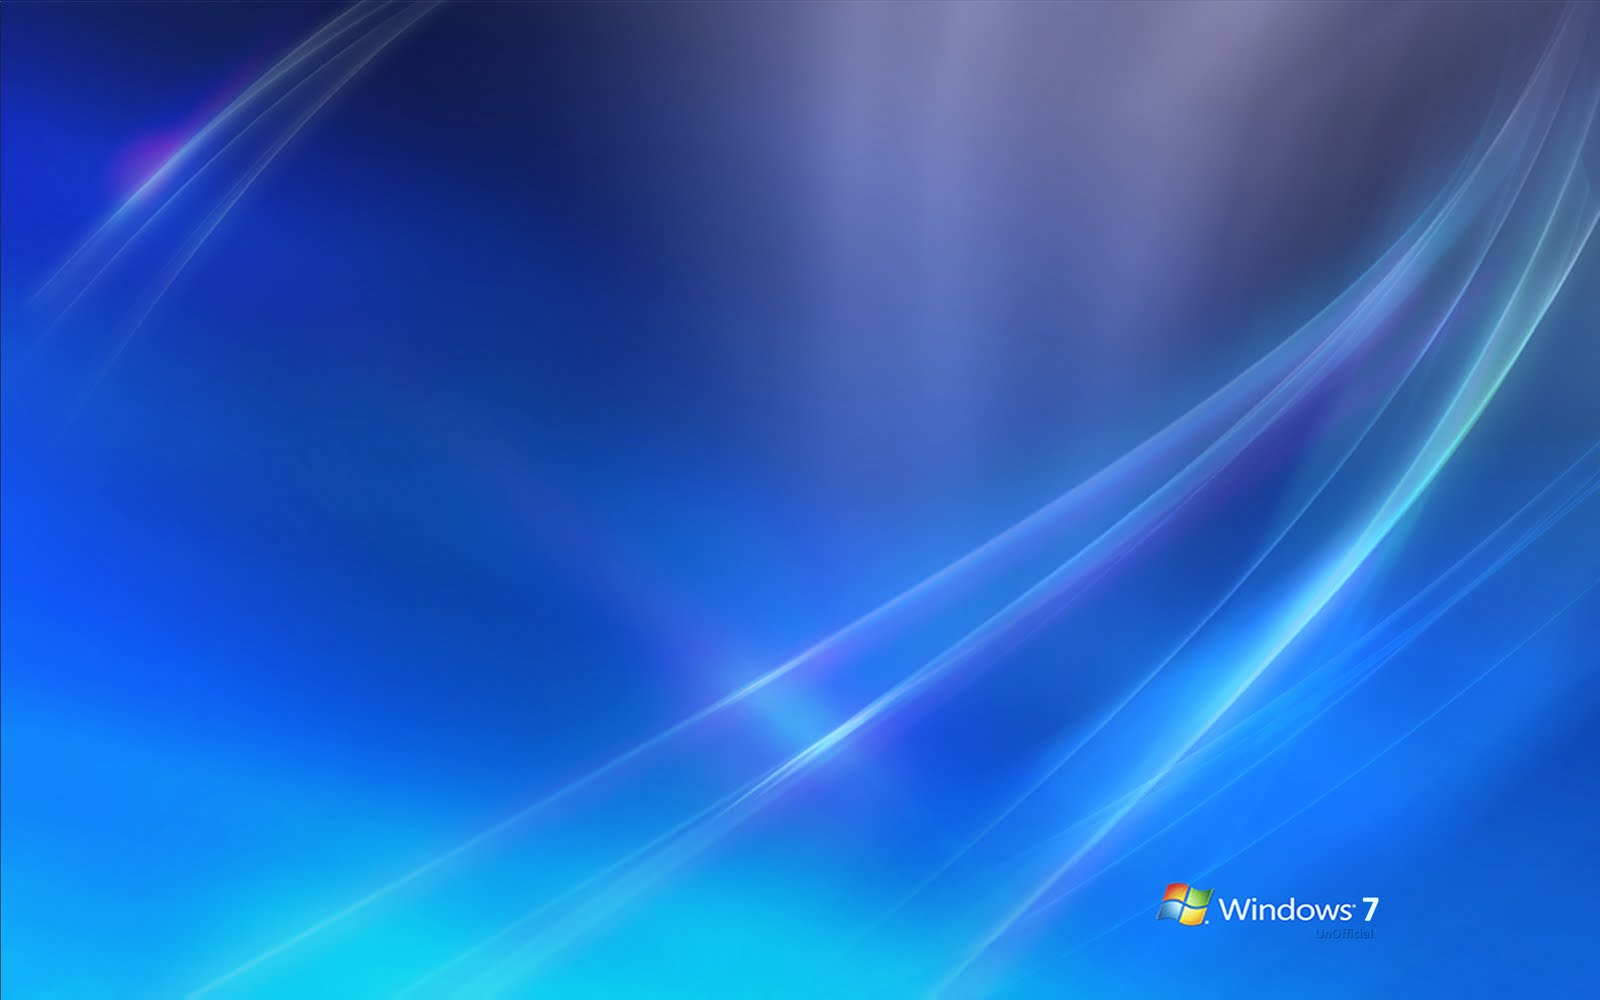 Aero Wallpaper Windows 7 Download Wallpaper 1600x1000